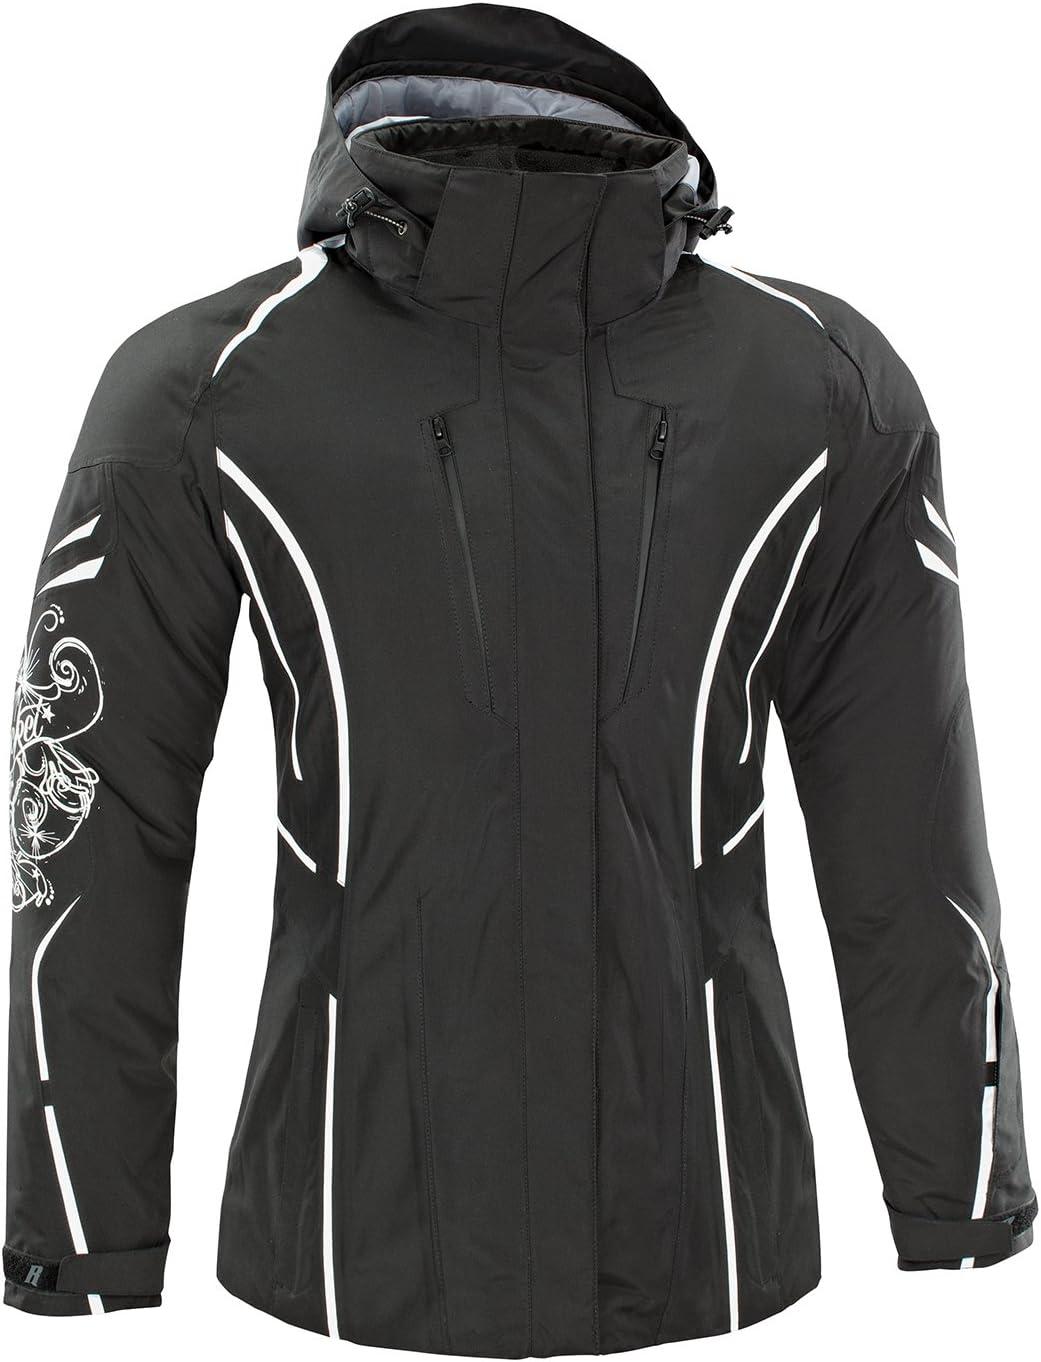 Joe Rocket Womens Black//White Rocket Crew Windproof /& Water Resistant Jacket